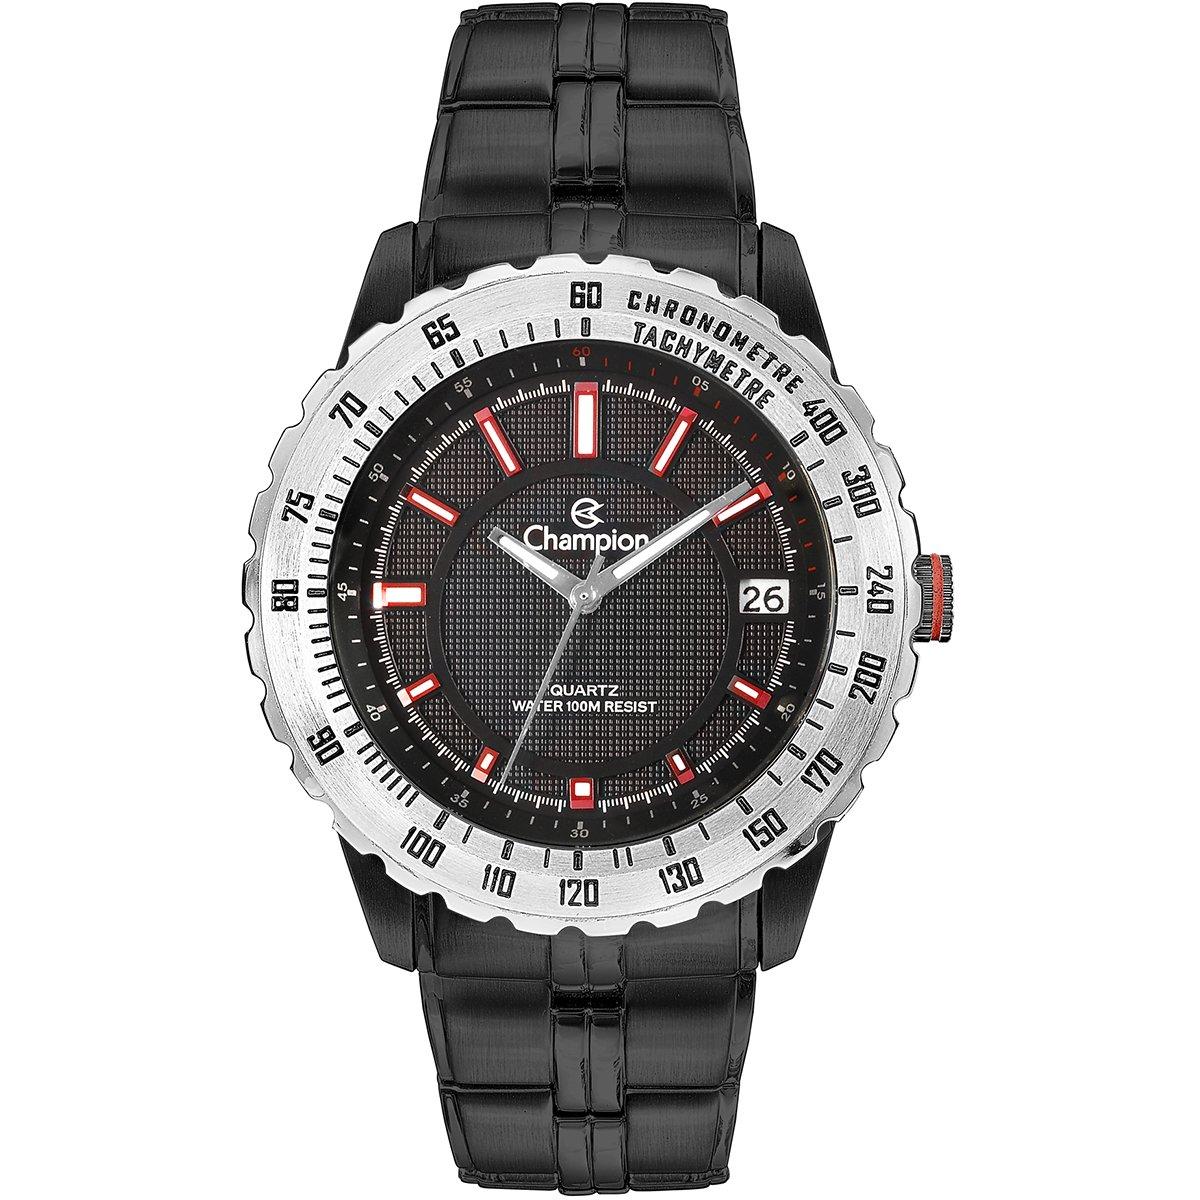 91a91864c05 Relógio Champion CA3030 Compre Agora Netshoes